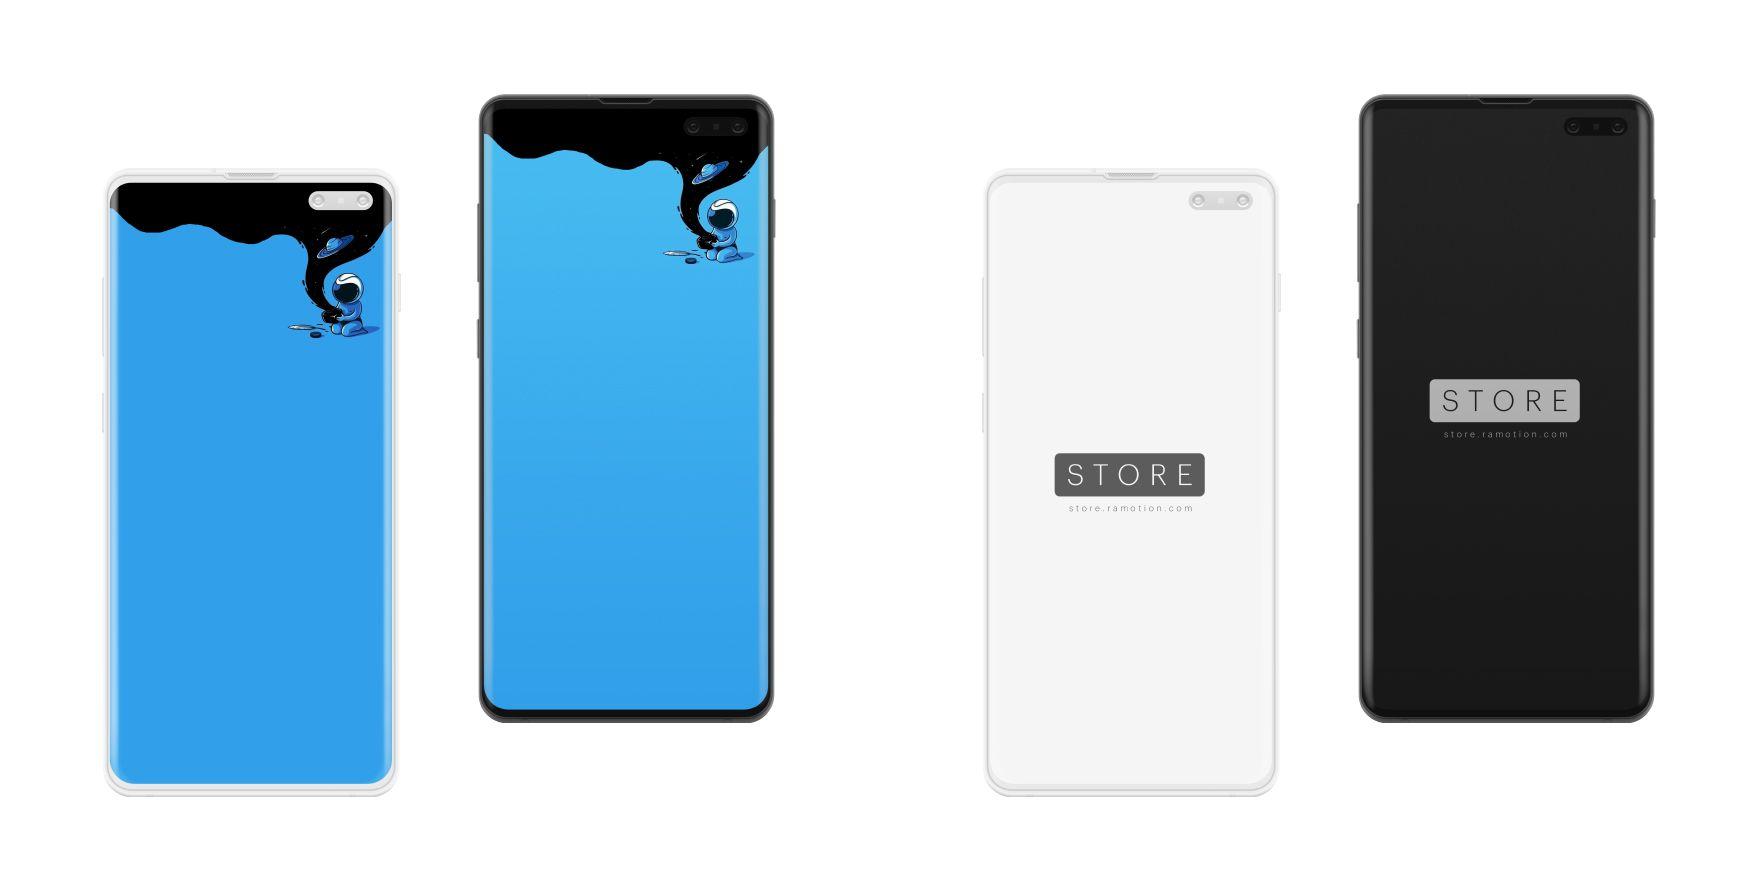 android mockup